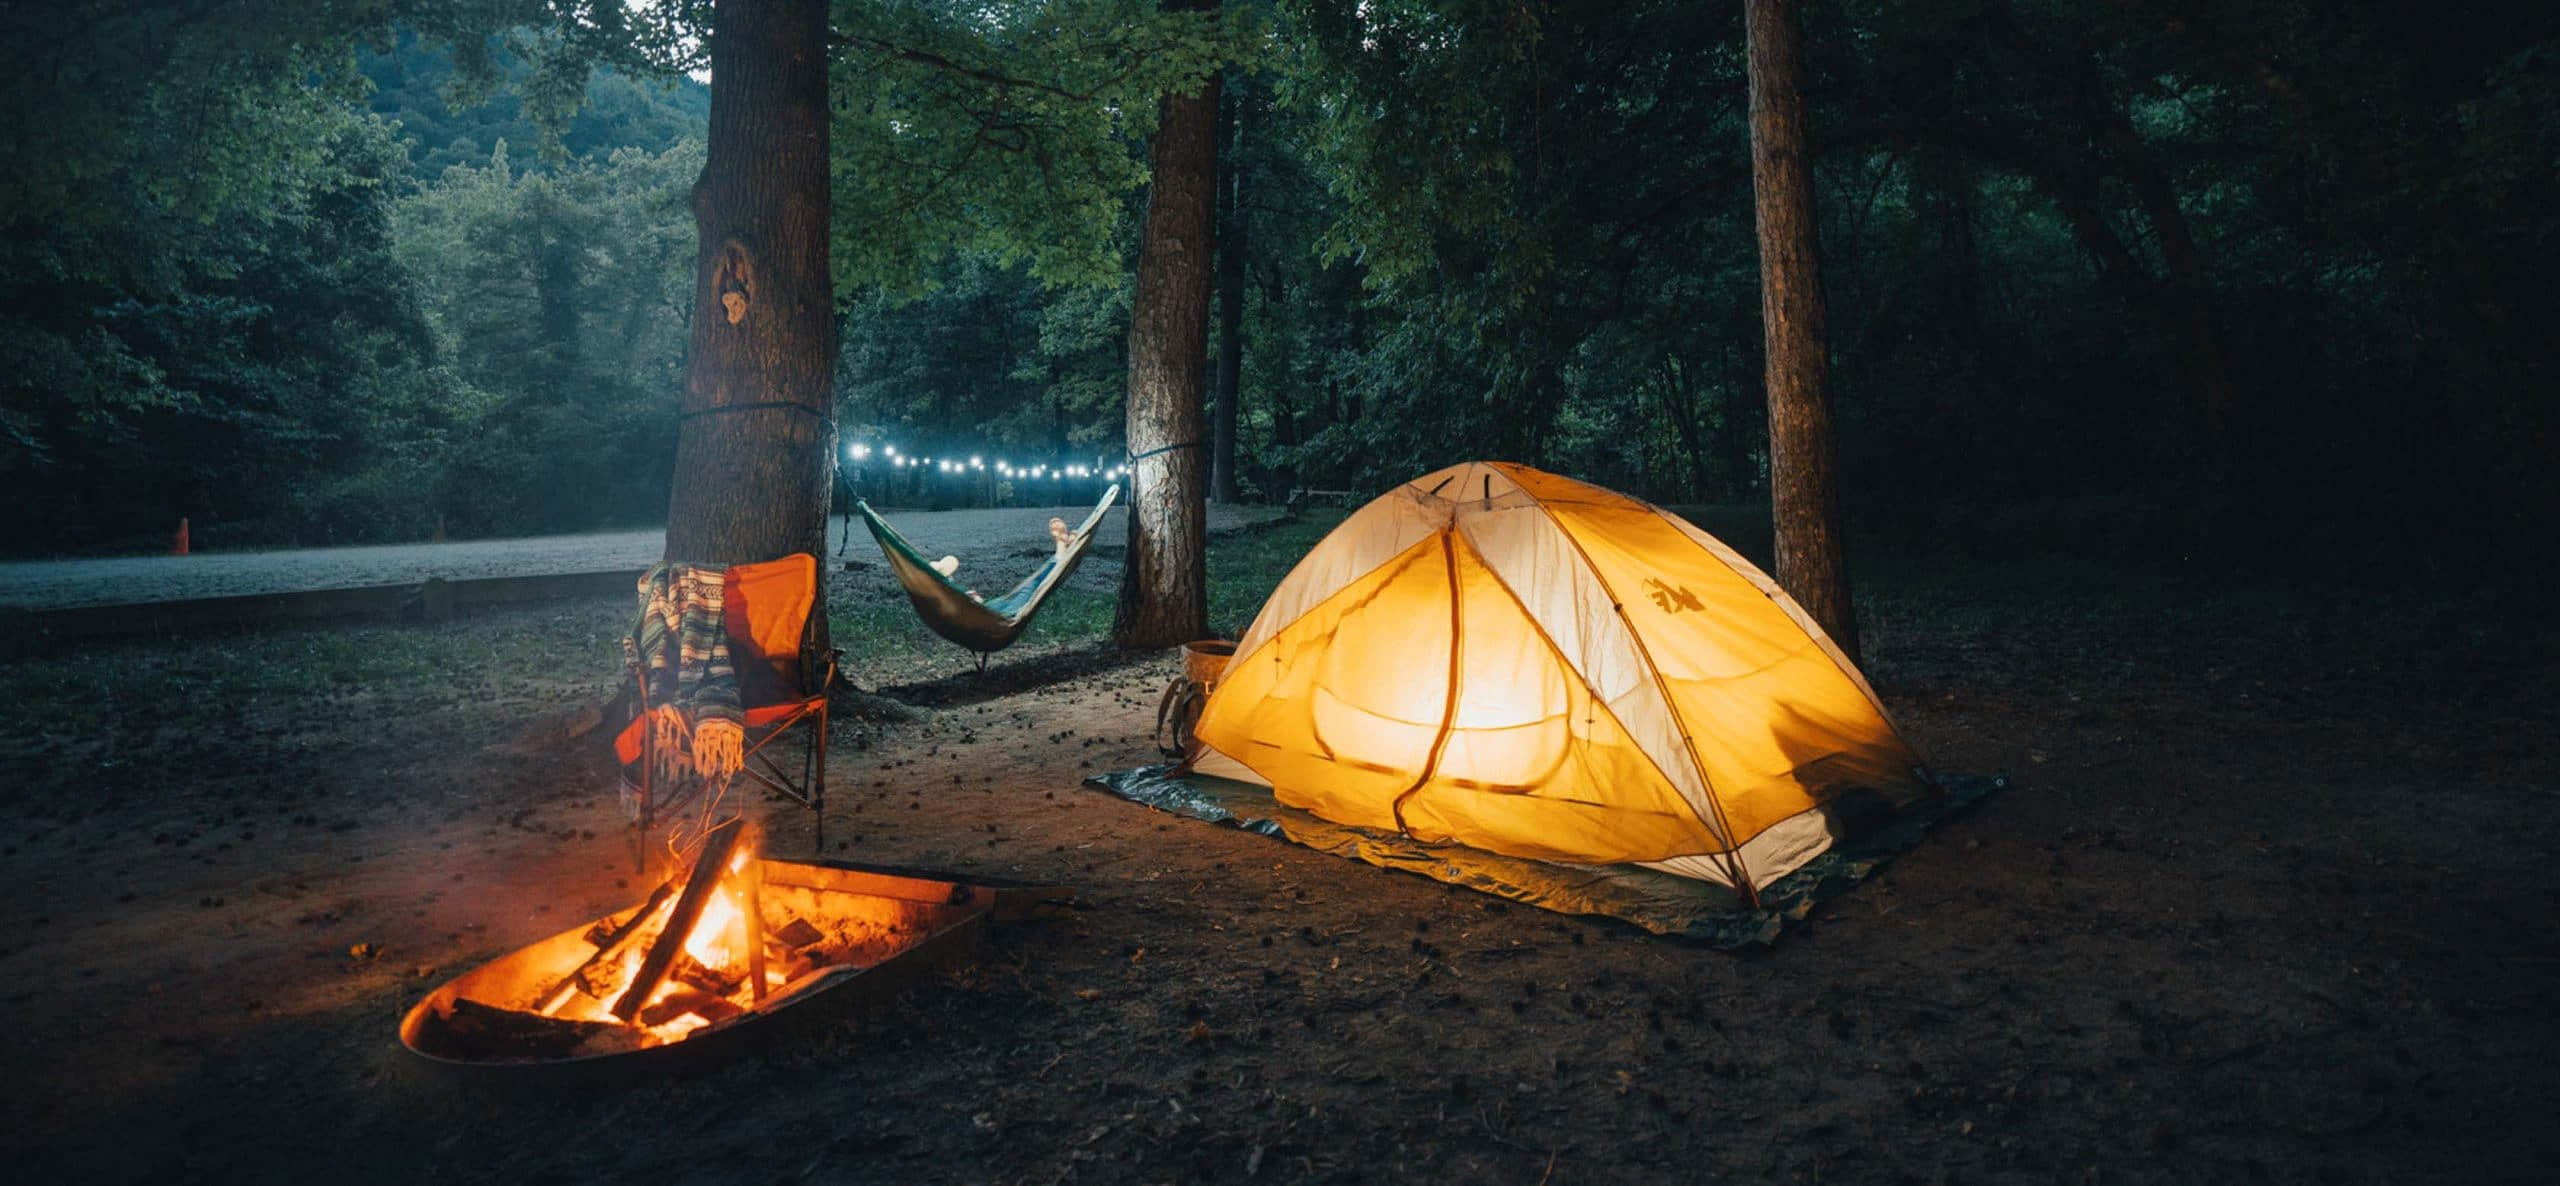 camping tent at kyles landing